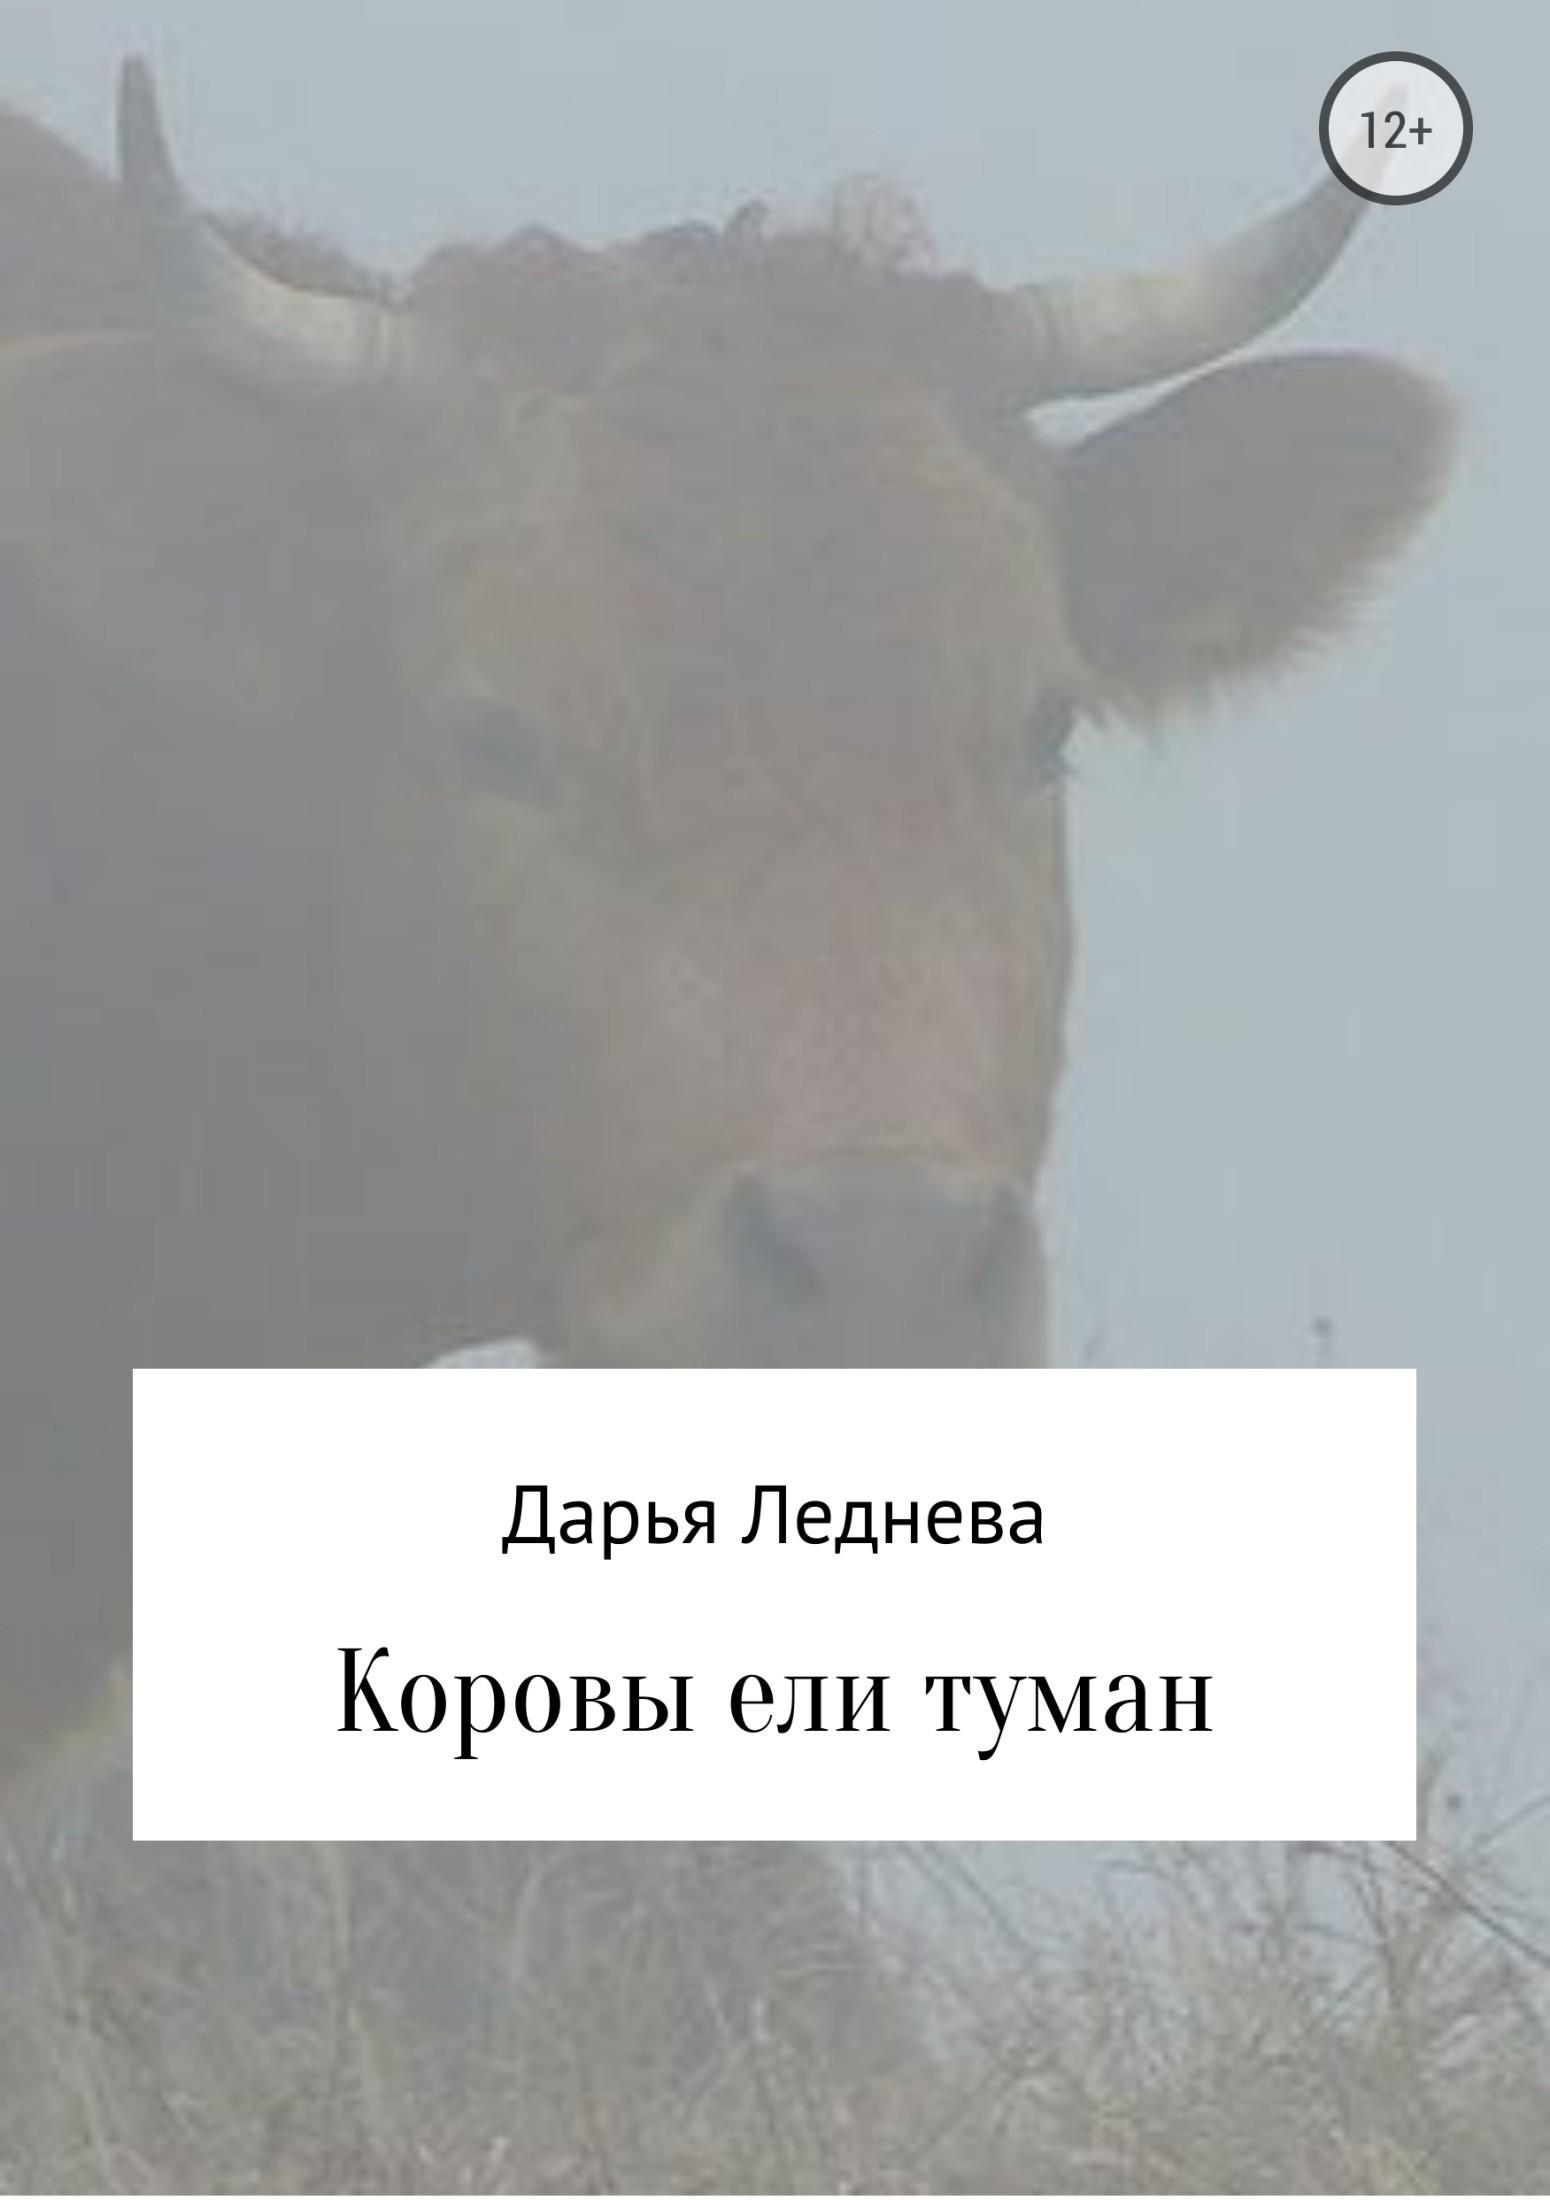 Дарья Михайловна Леднева Коровы ели туман